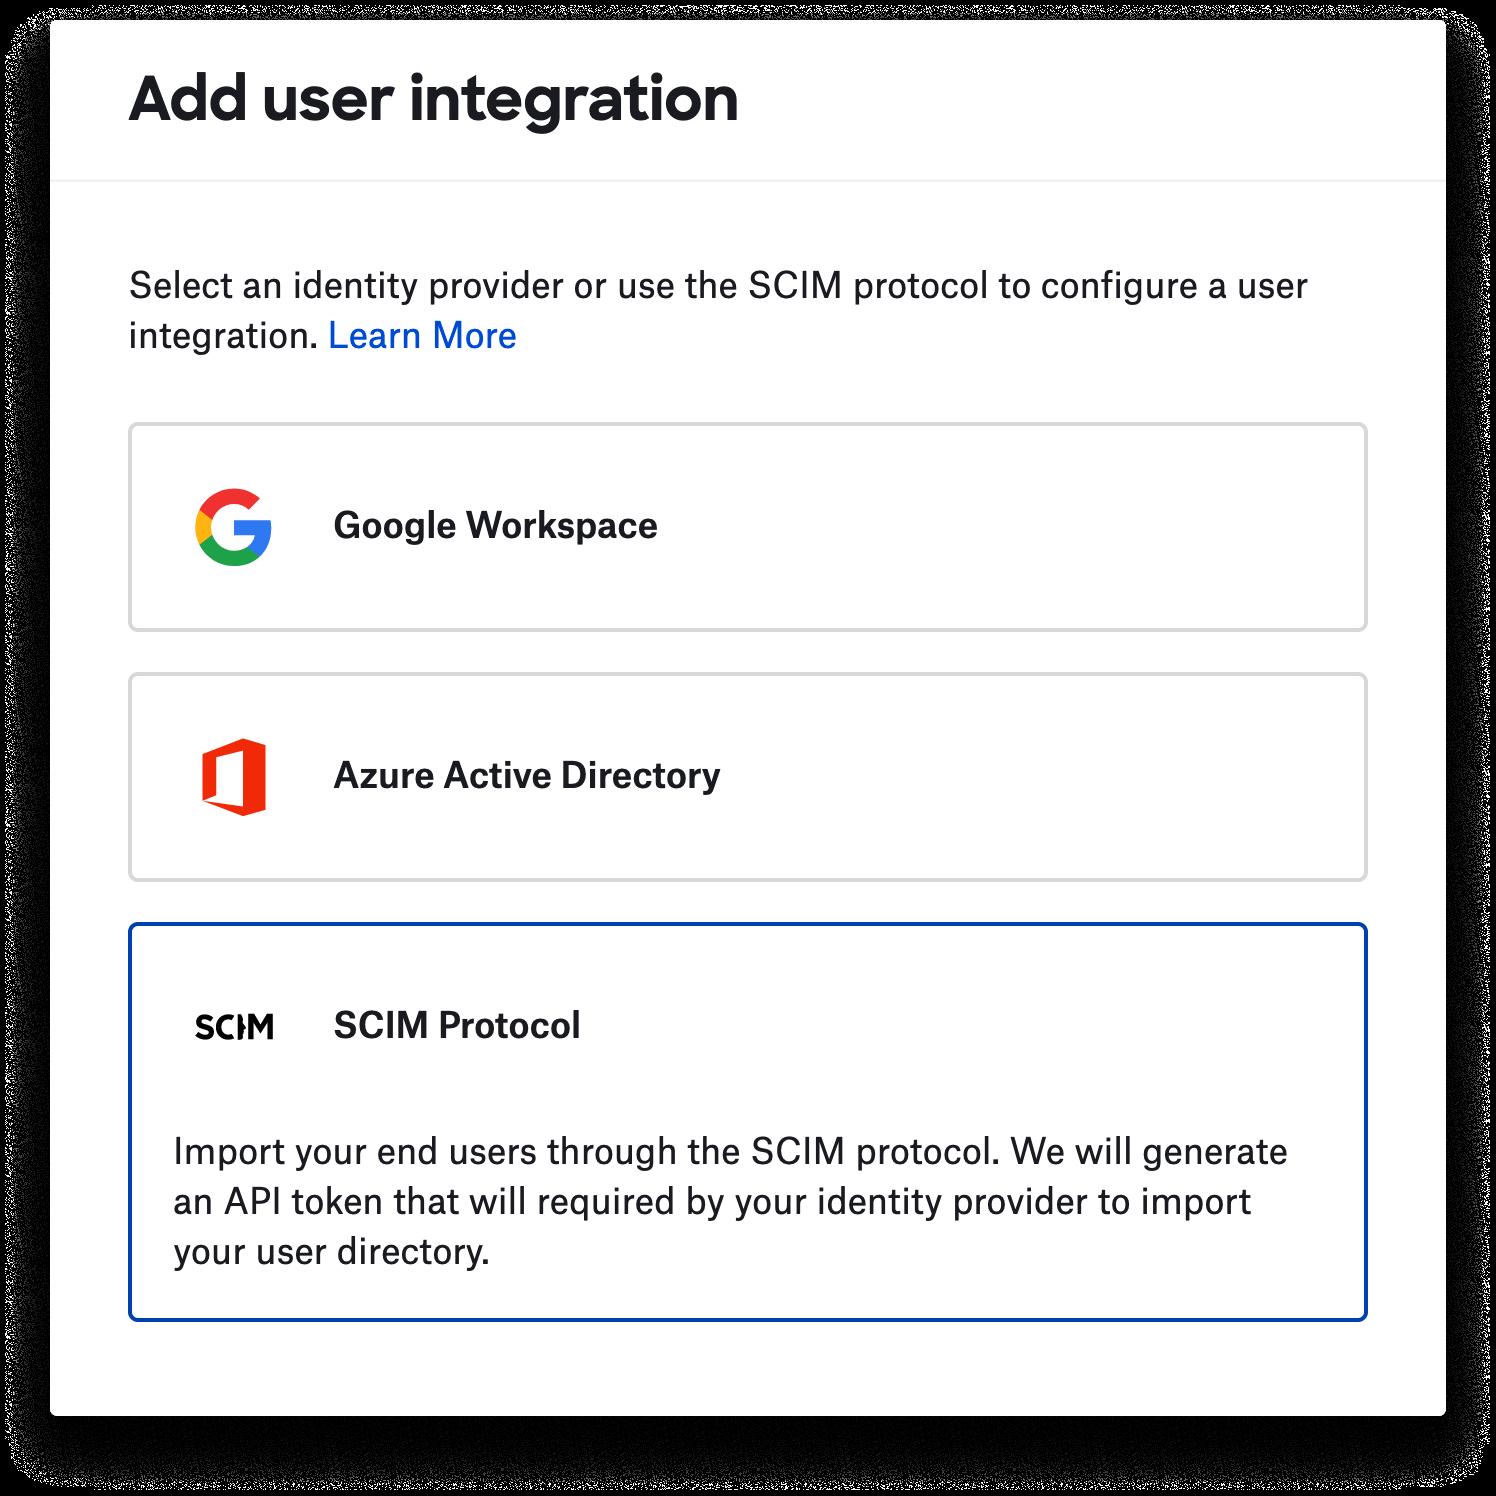 Adding a new user integration.